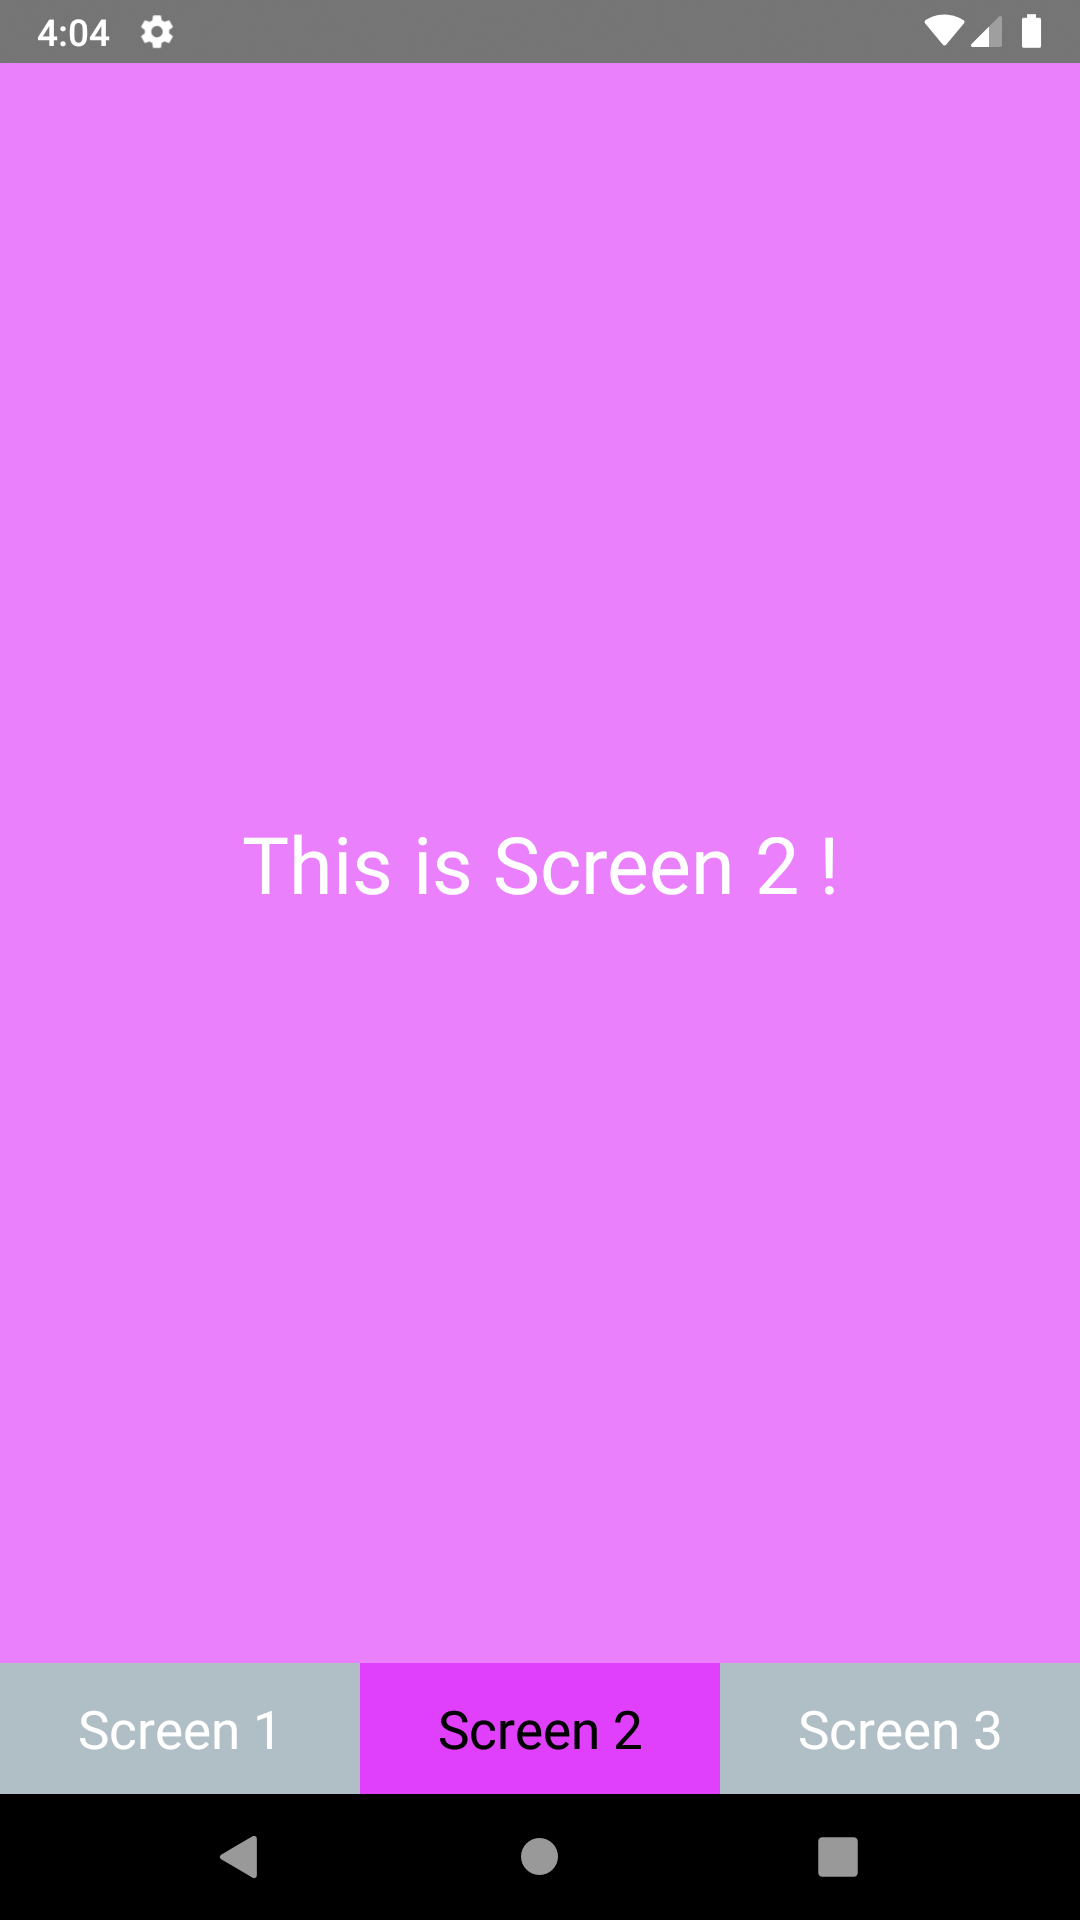 React Native Highlight Bottom Tab Bar Selected Tab Android iOS Example